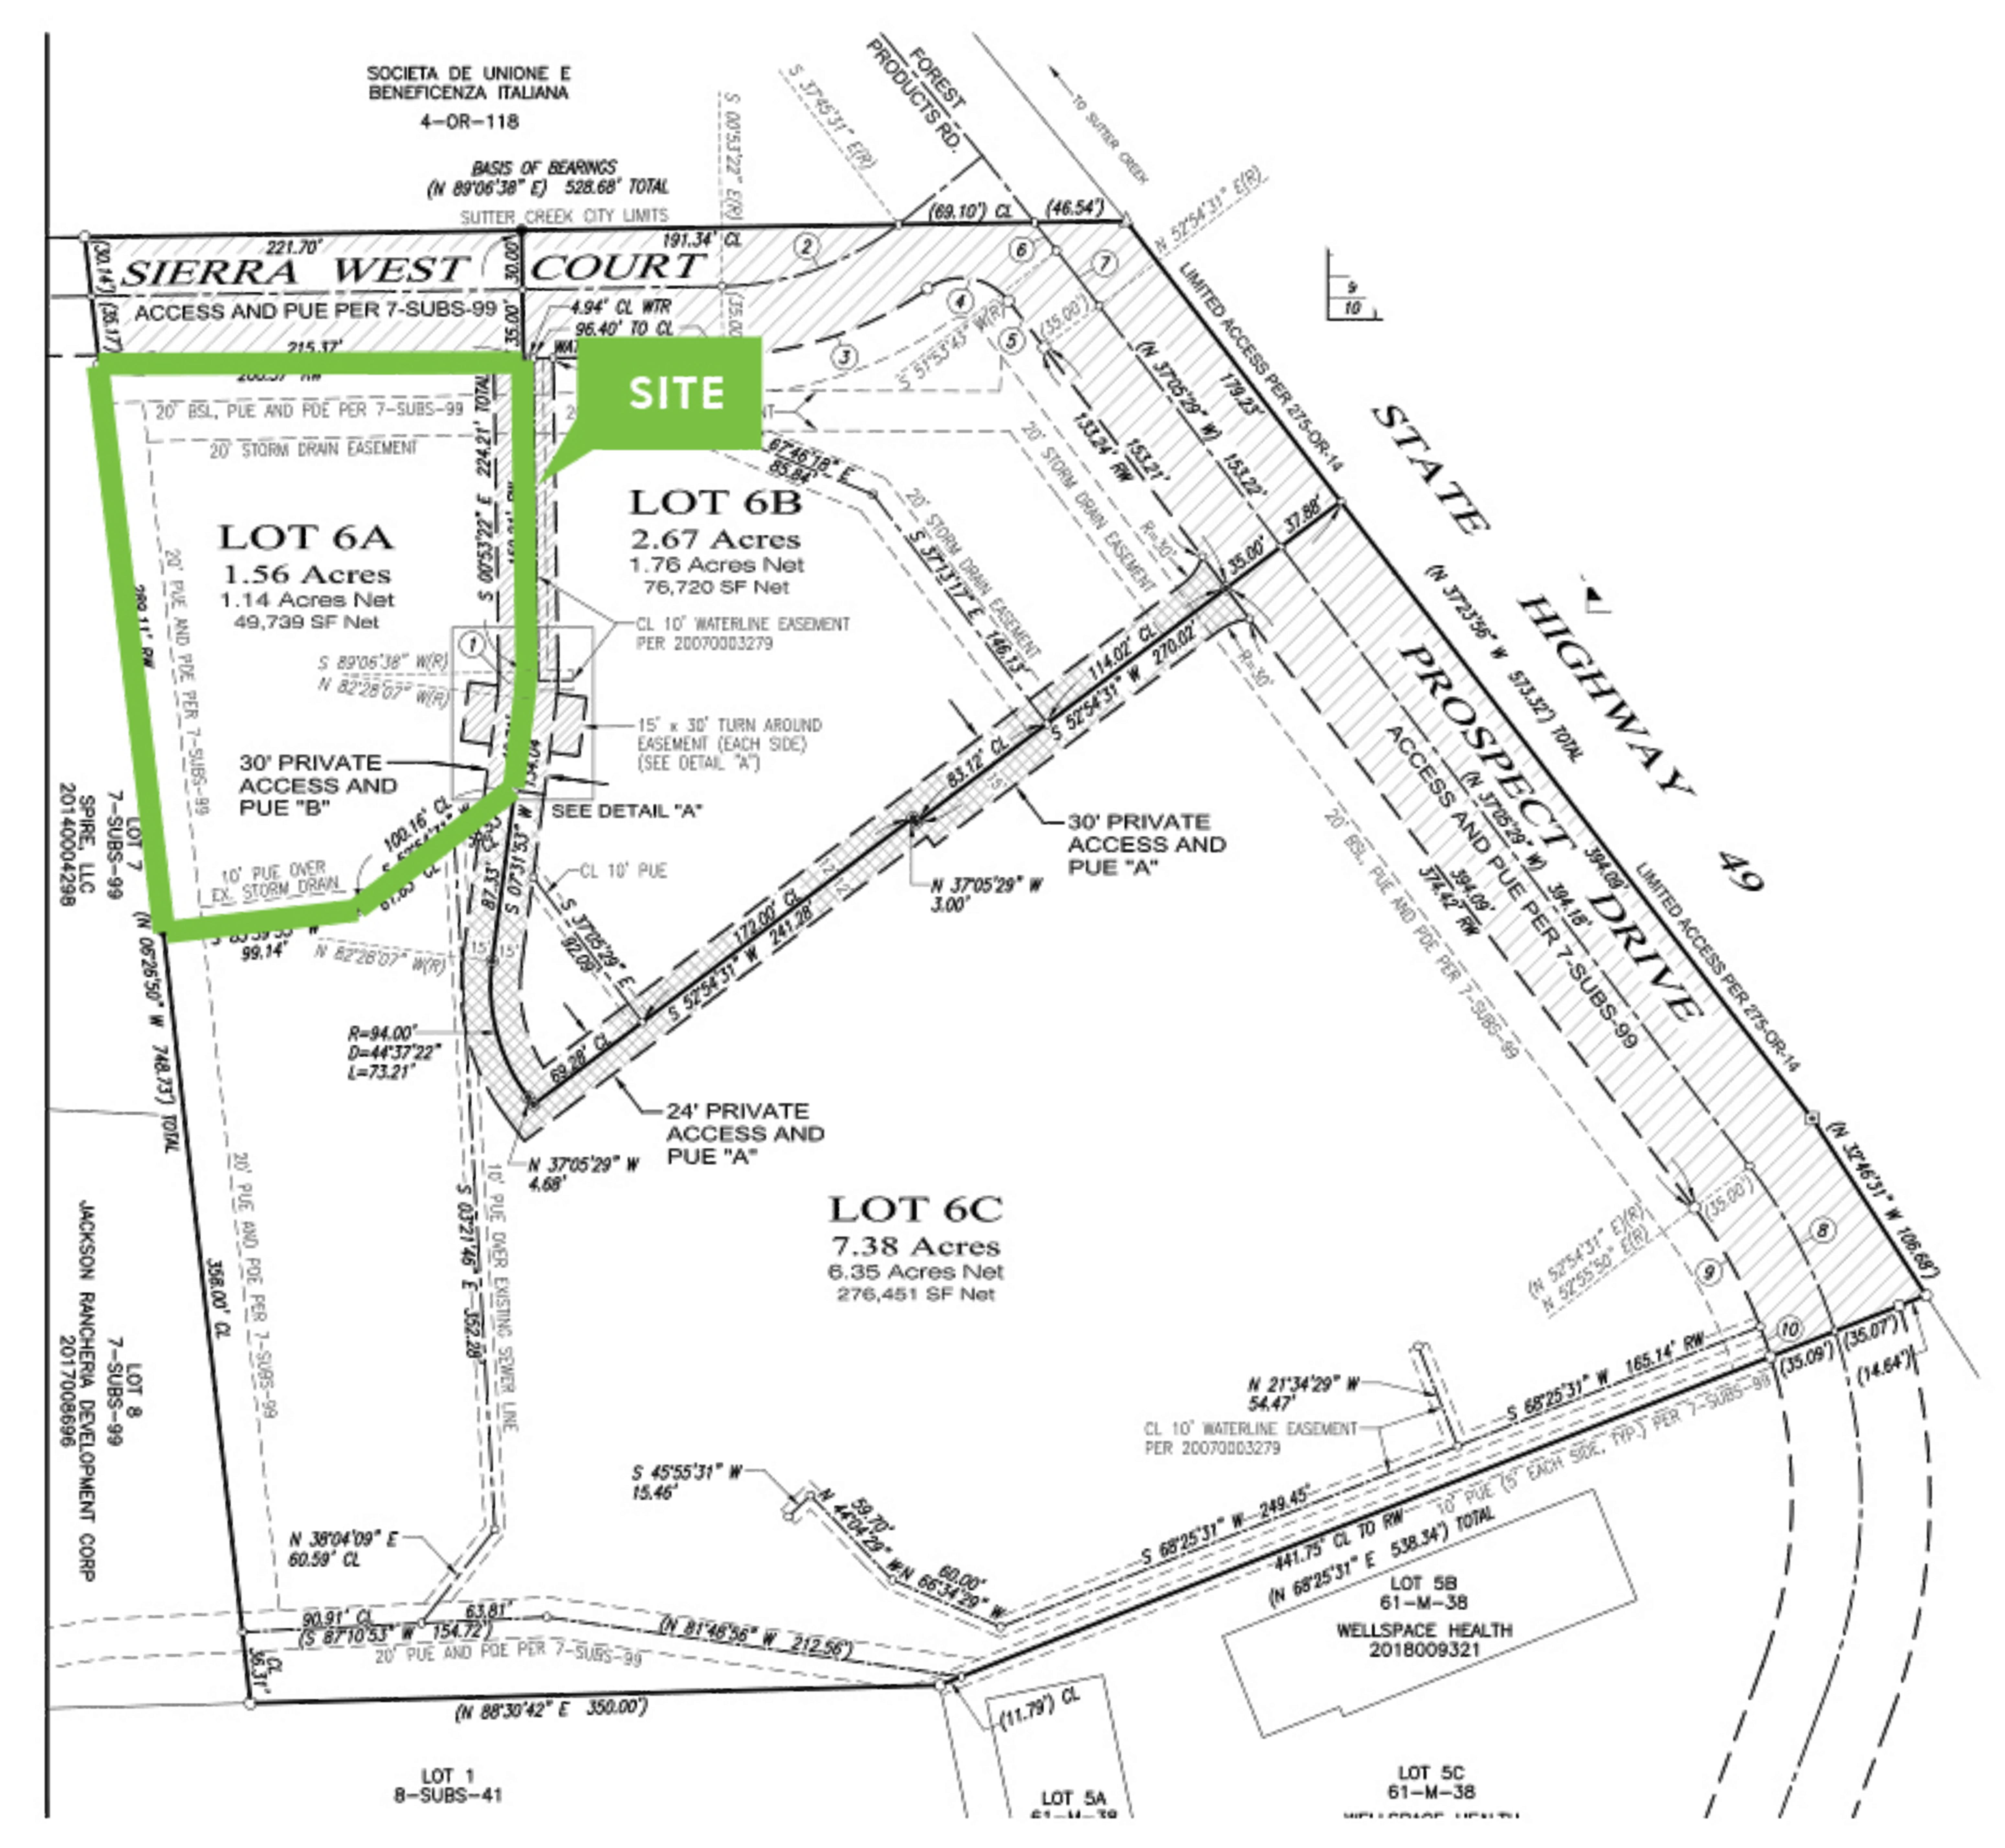 Commercial Land: site plan